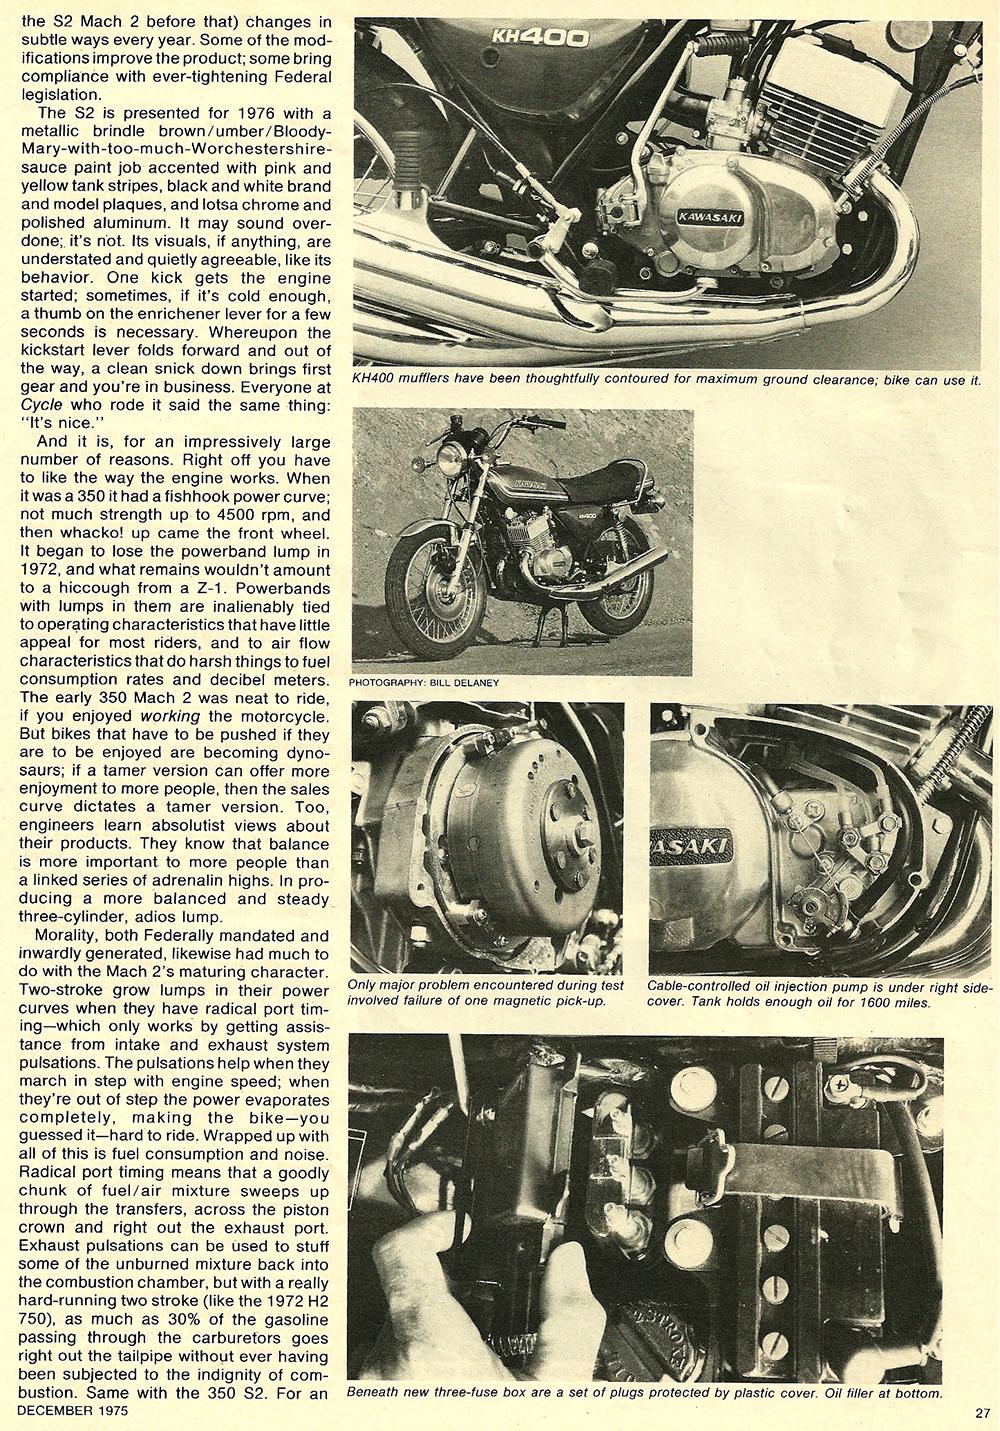 1976 Kawasaki KH400 road test 2.jpg